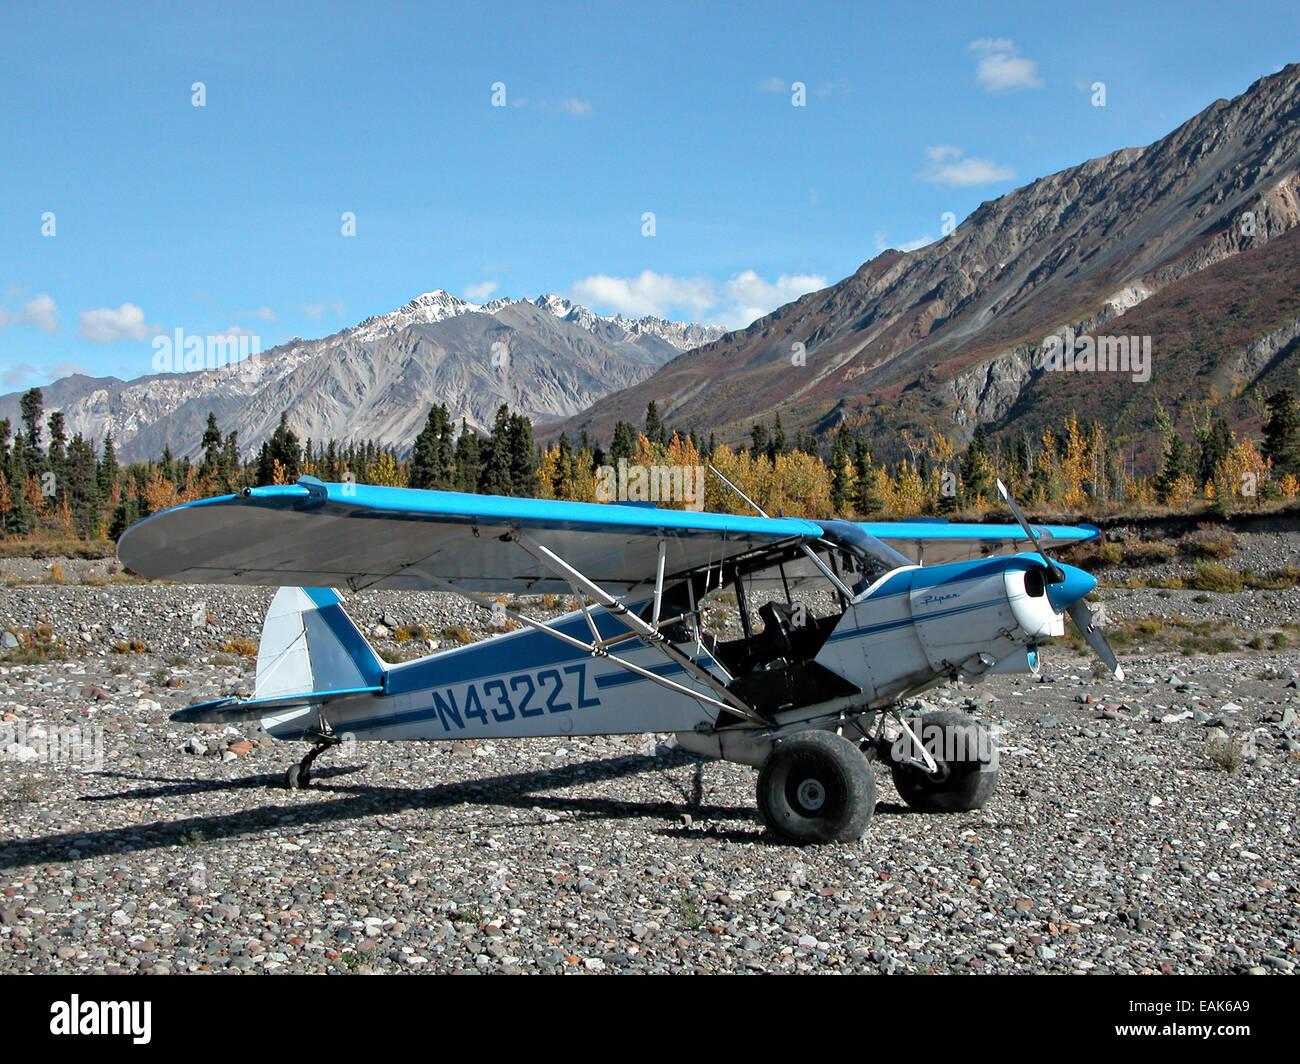 Super Cub Piper Bush Airplane Stock Photos & Super Cub Piper